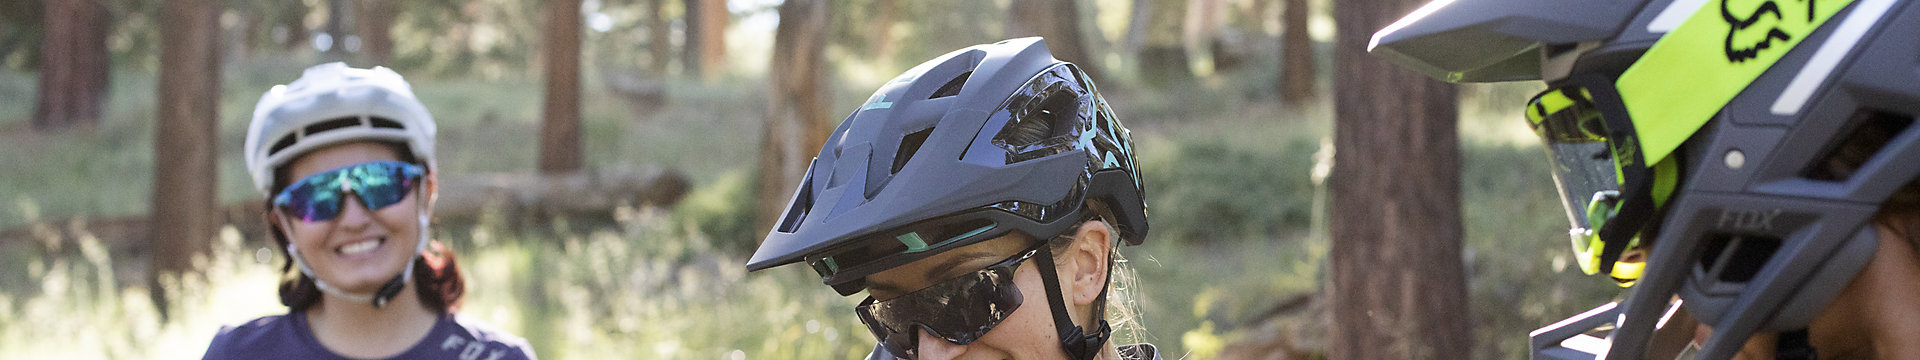 Fox Mountain Bike Helmets